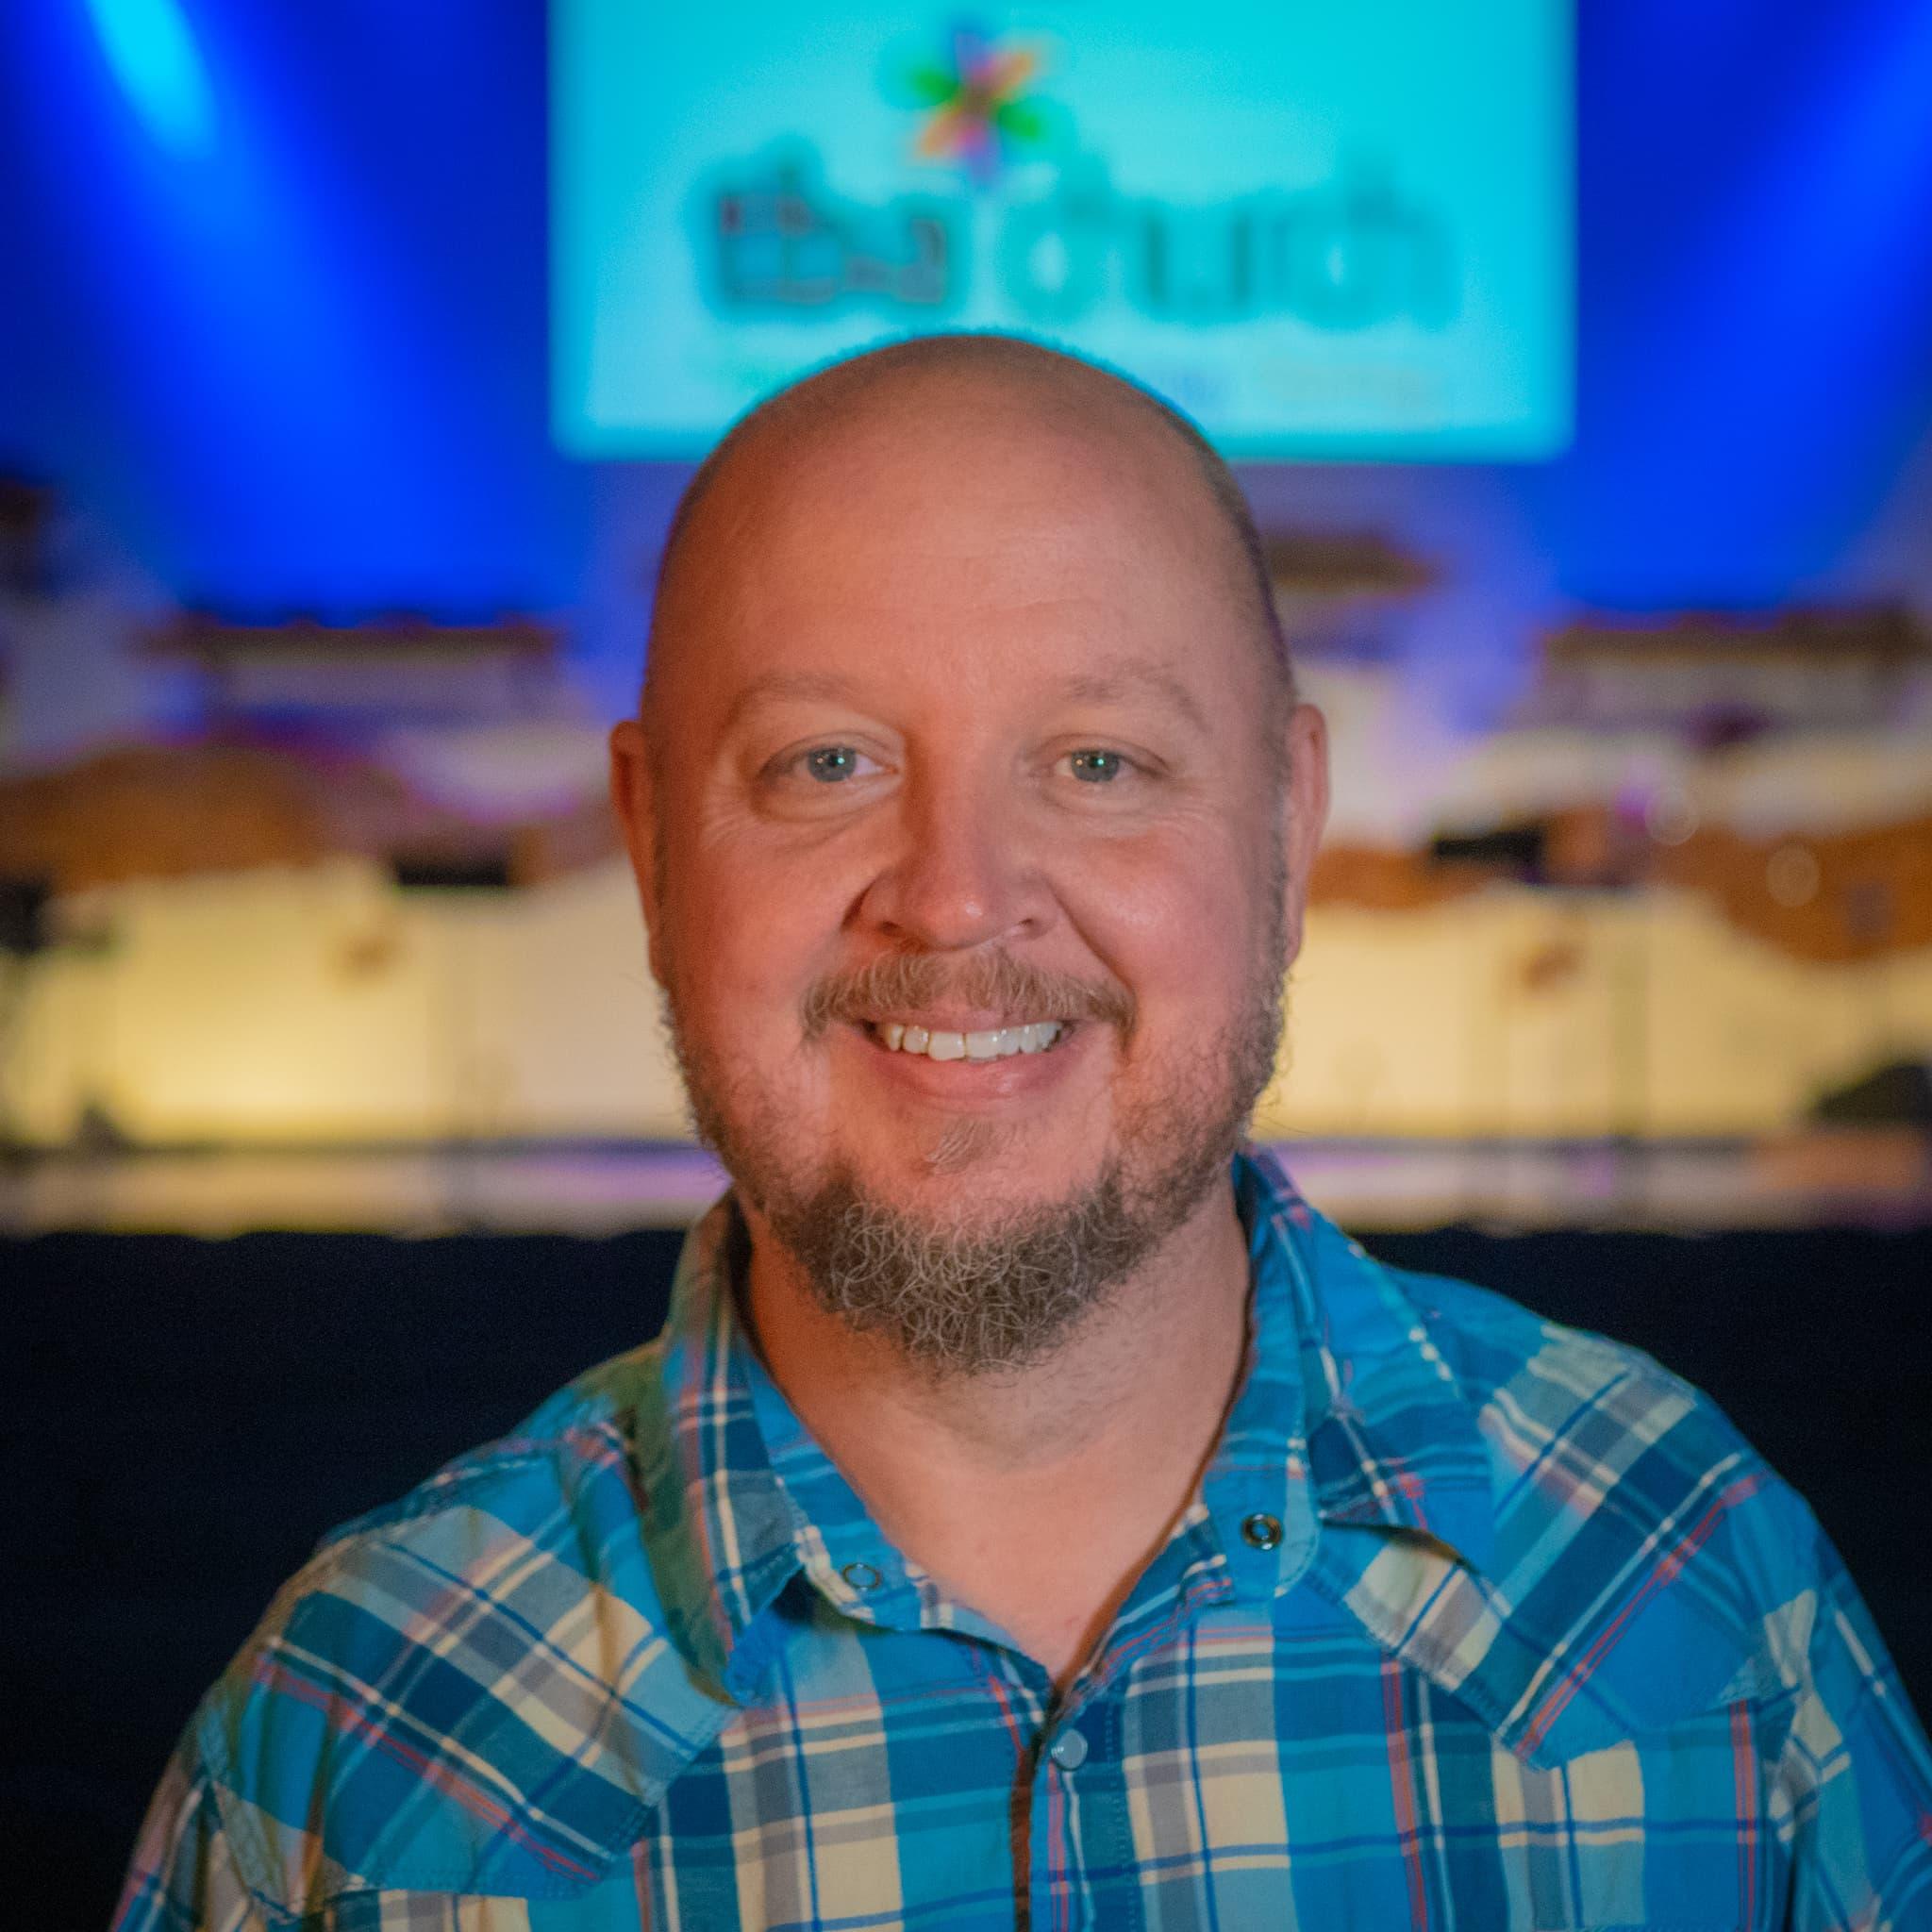 Bryan Stiverson